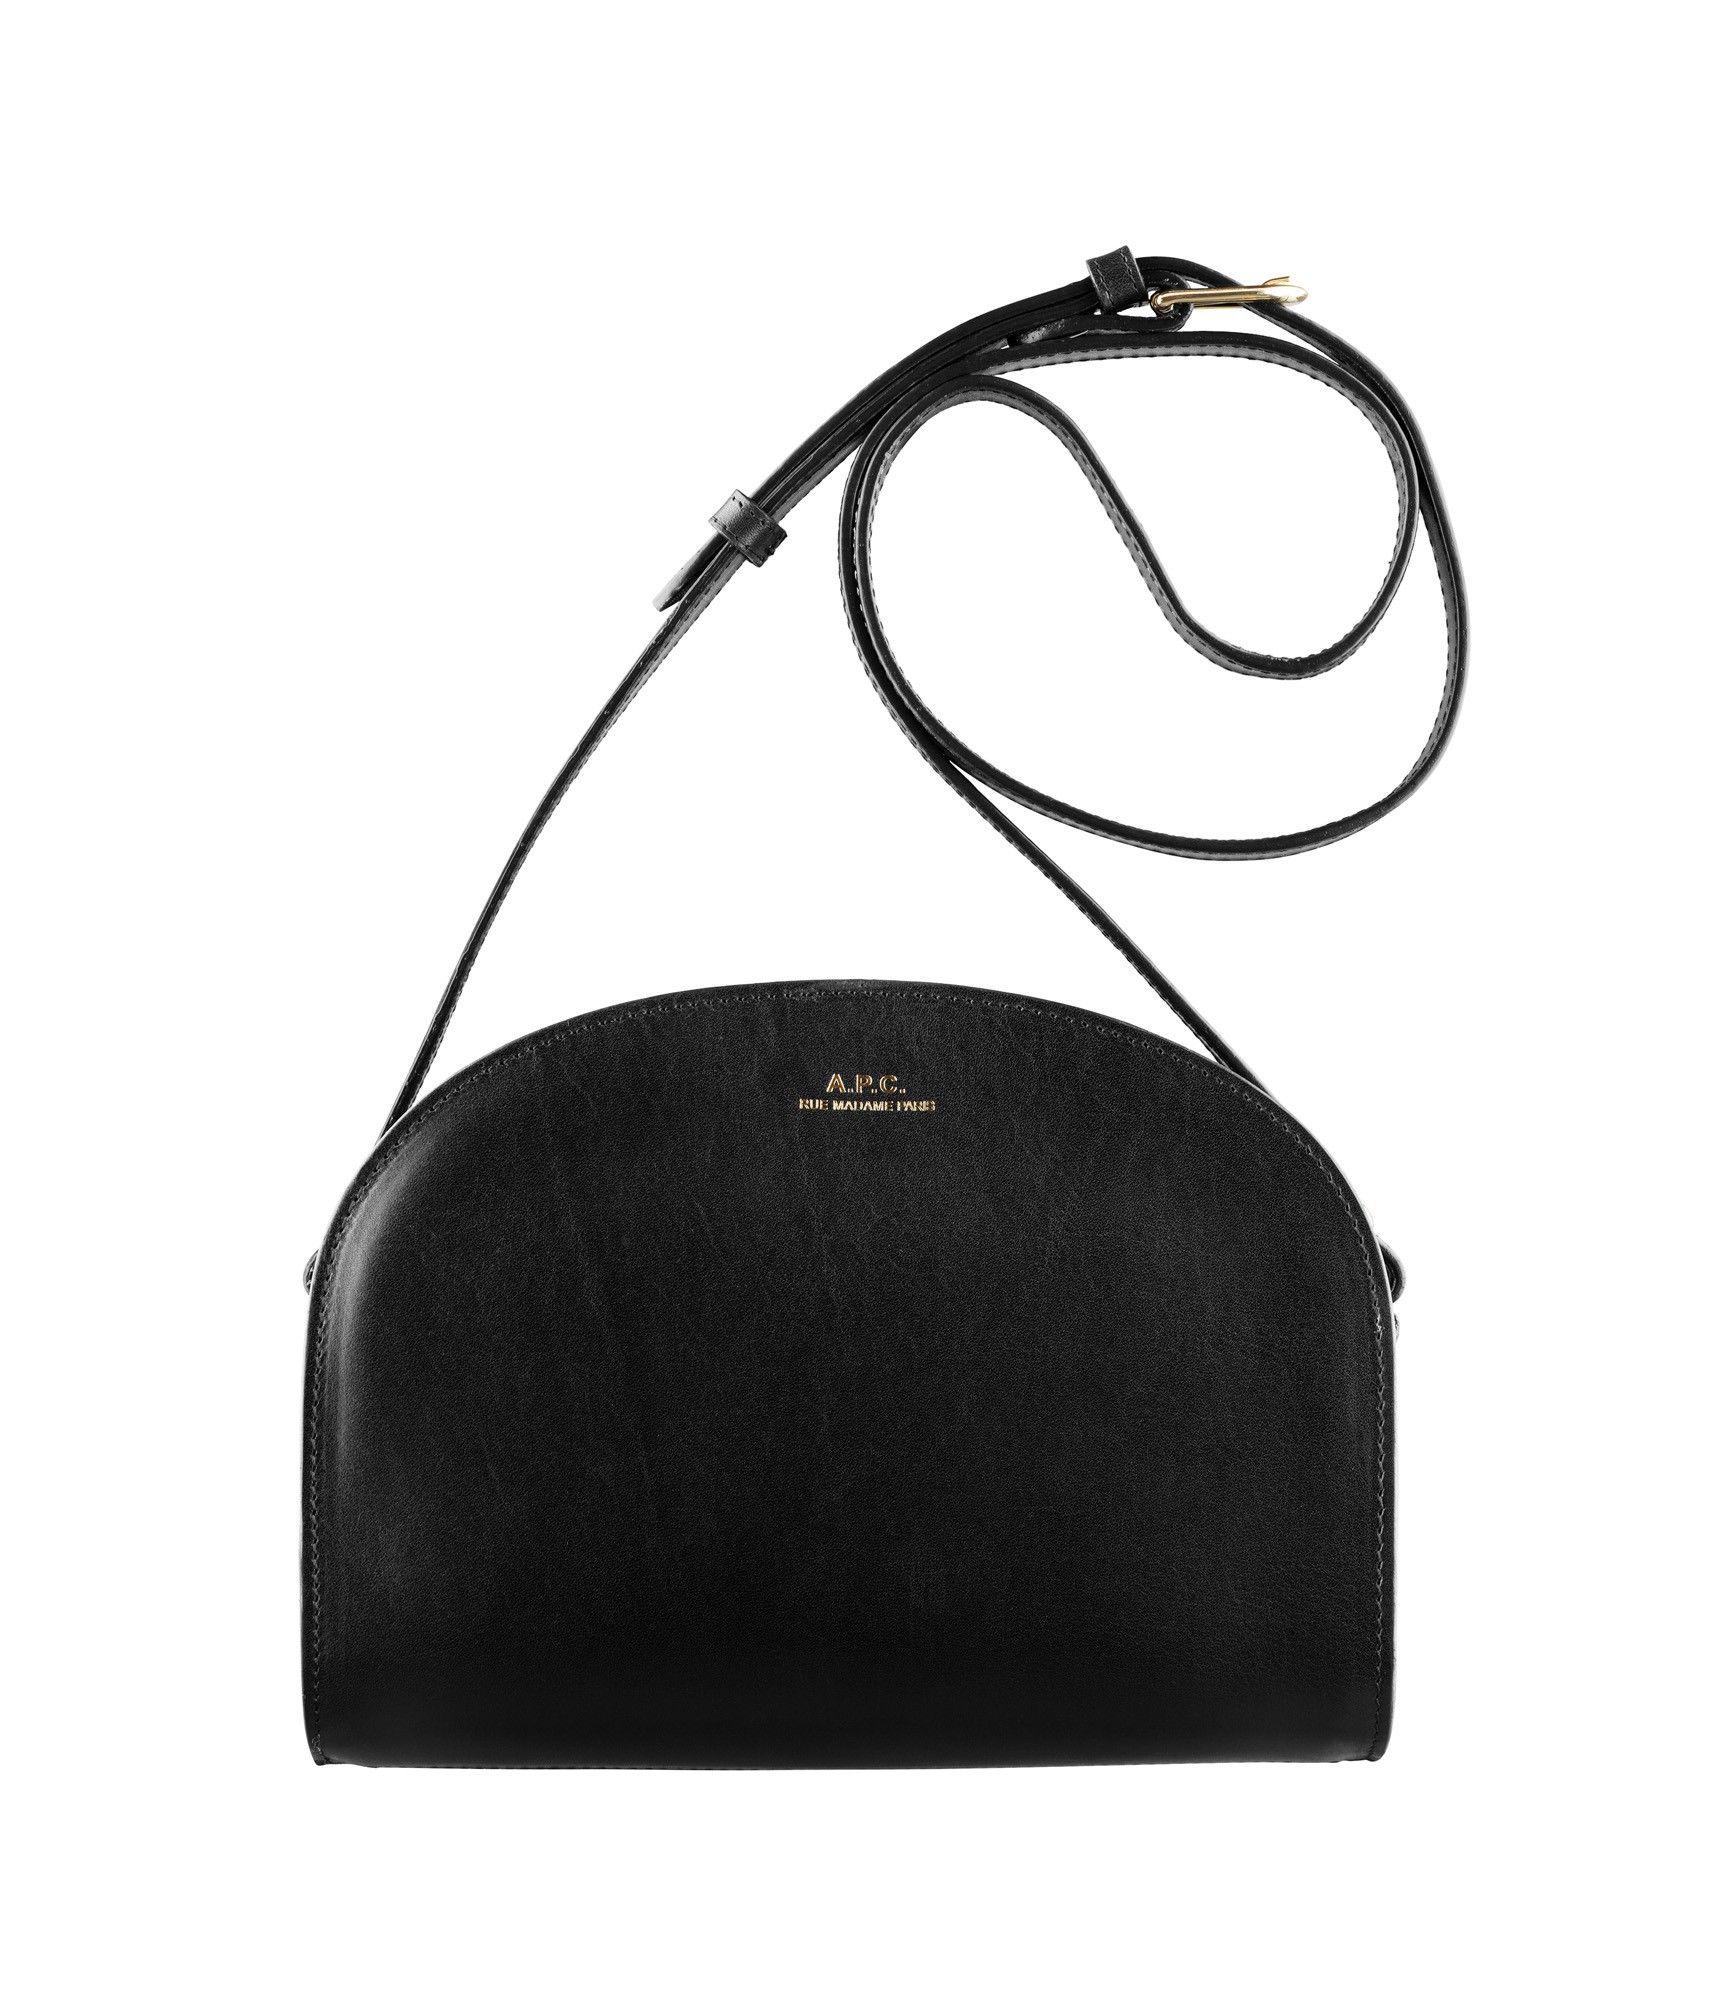 half moon bag bags women c l o s e t pinterest. Black Bedroom Furniture Sets. Home Design Ideas